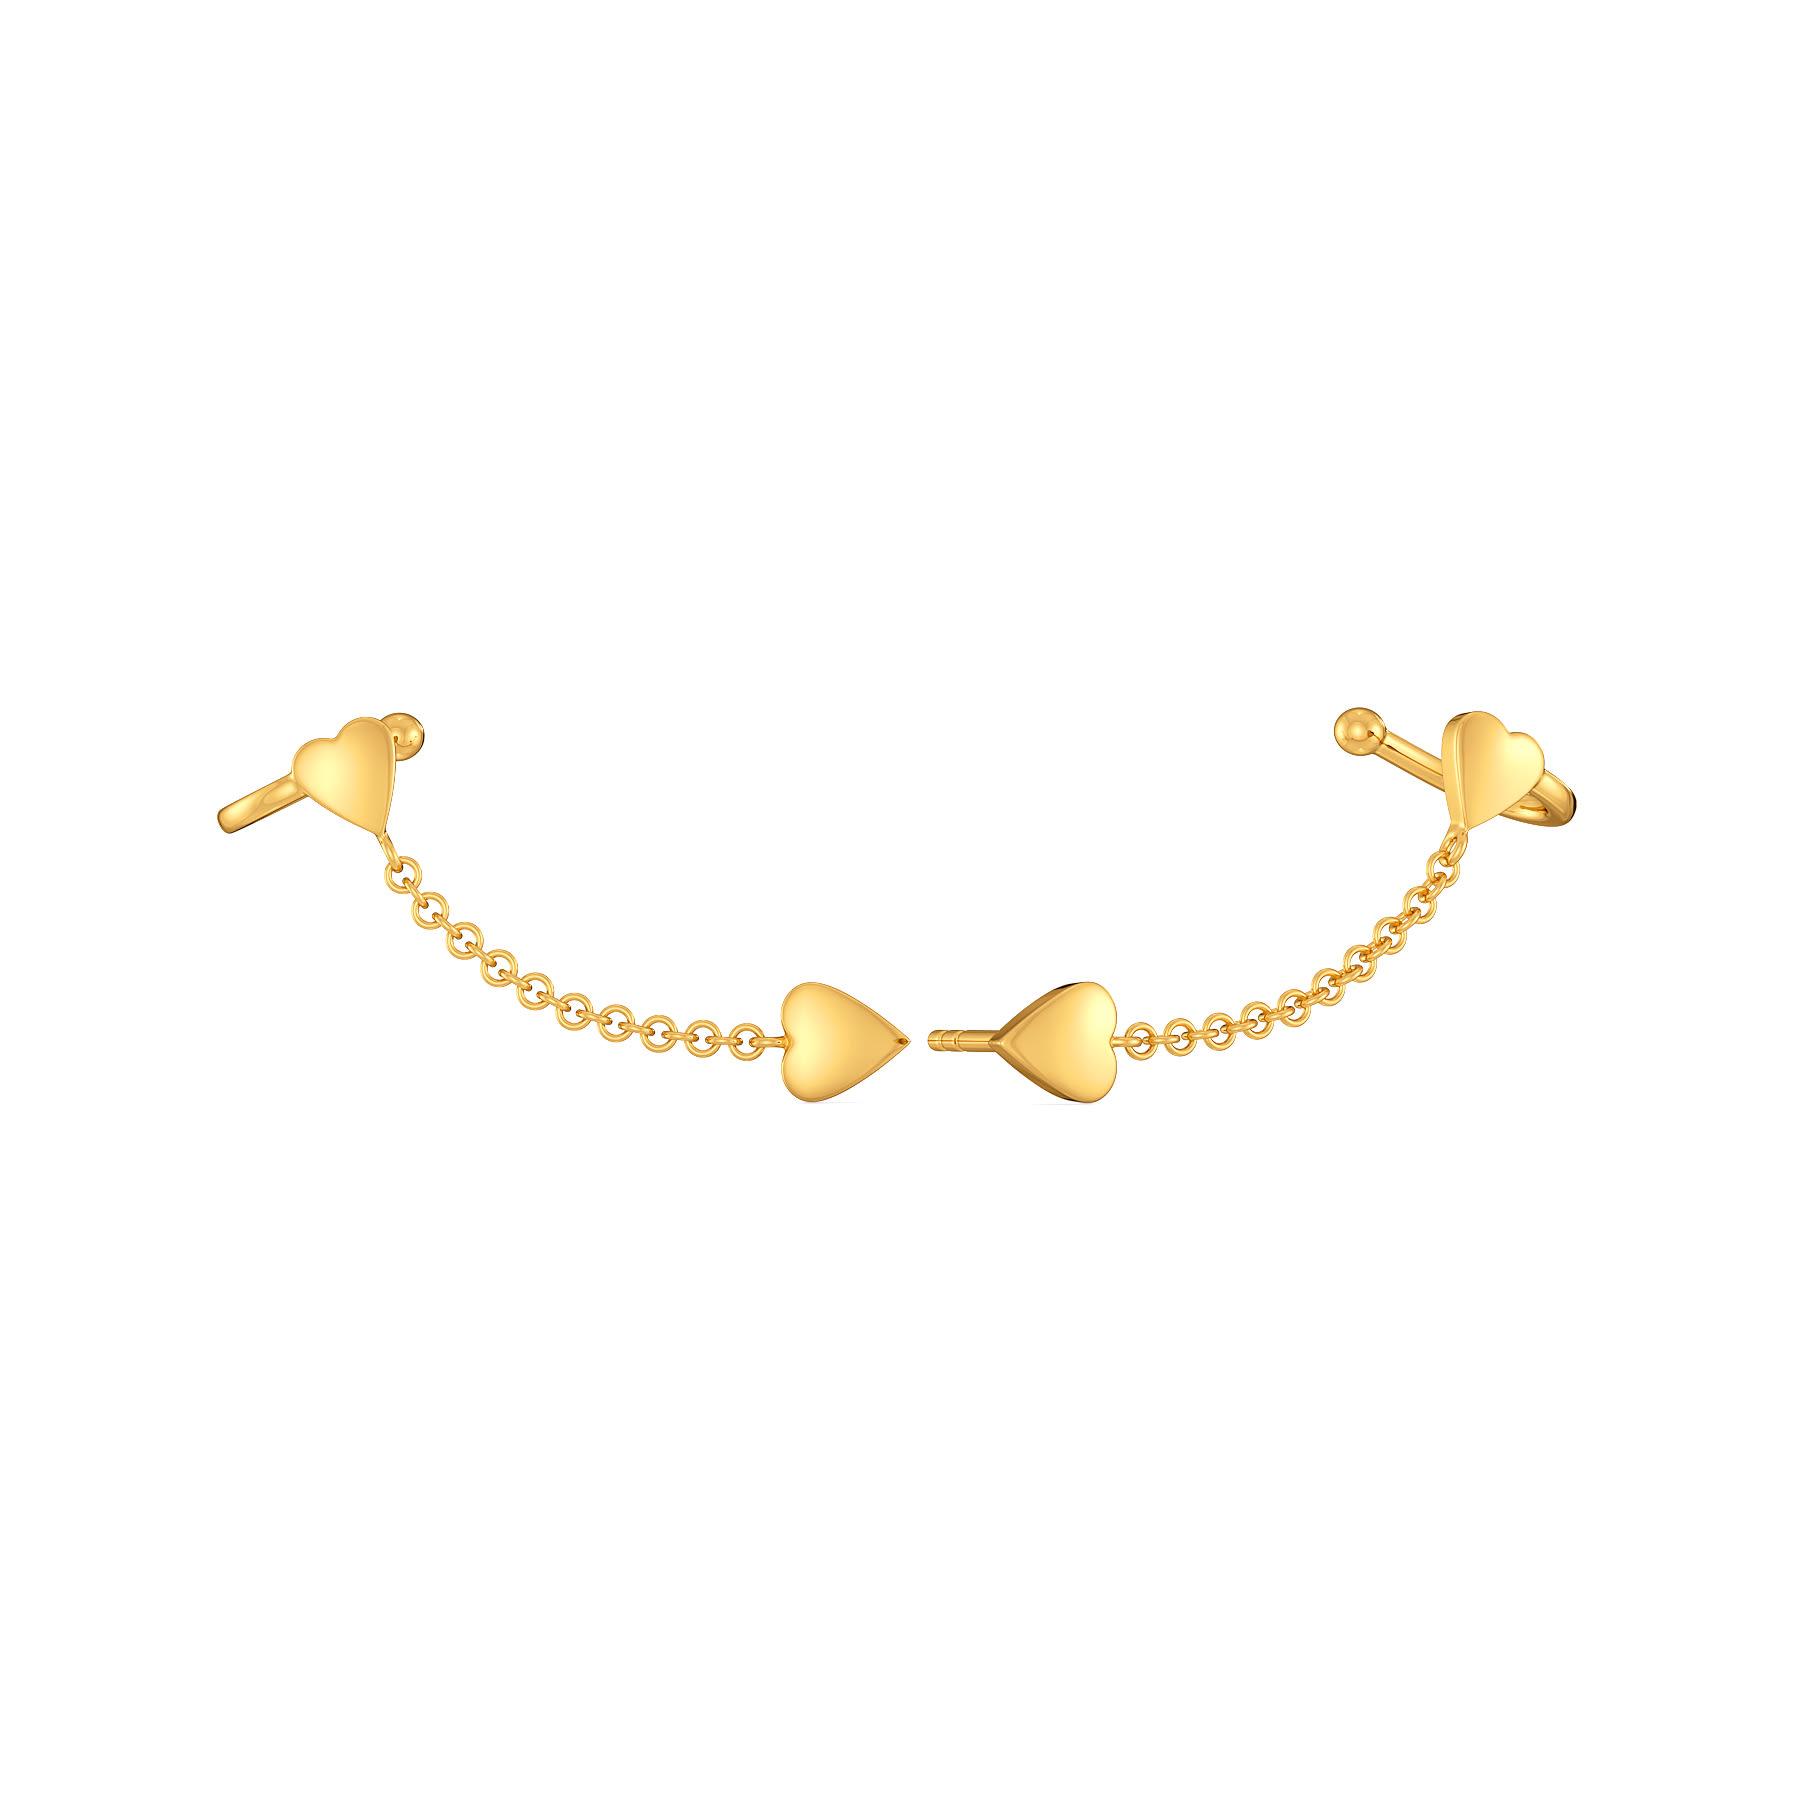 Fringe Connection Gold Earrings